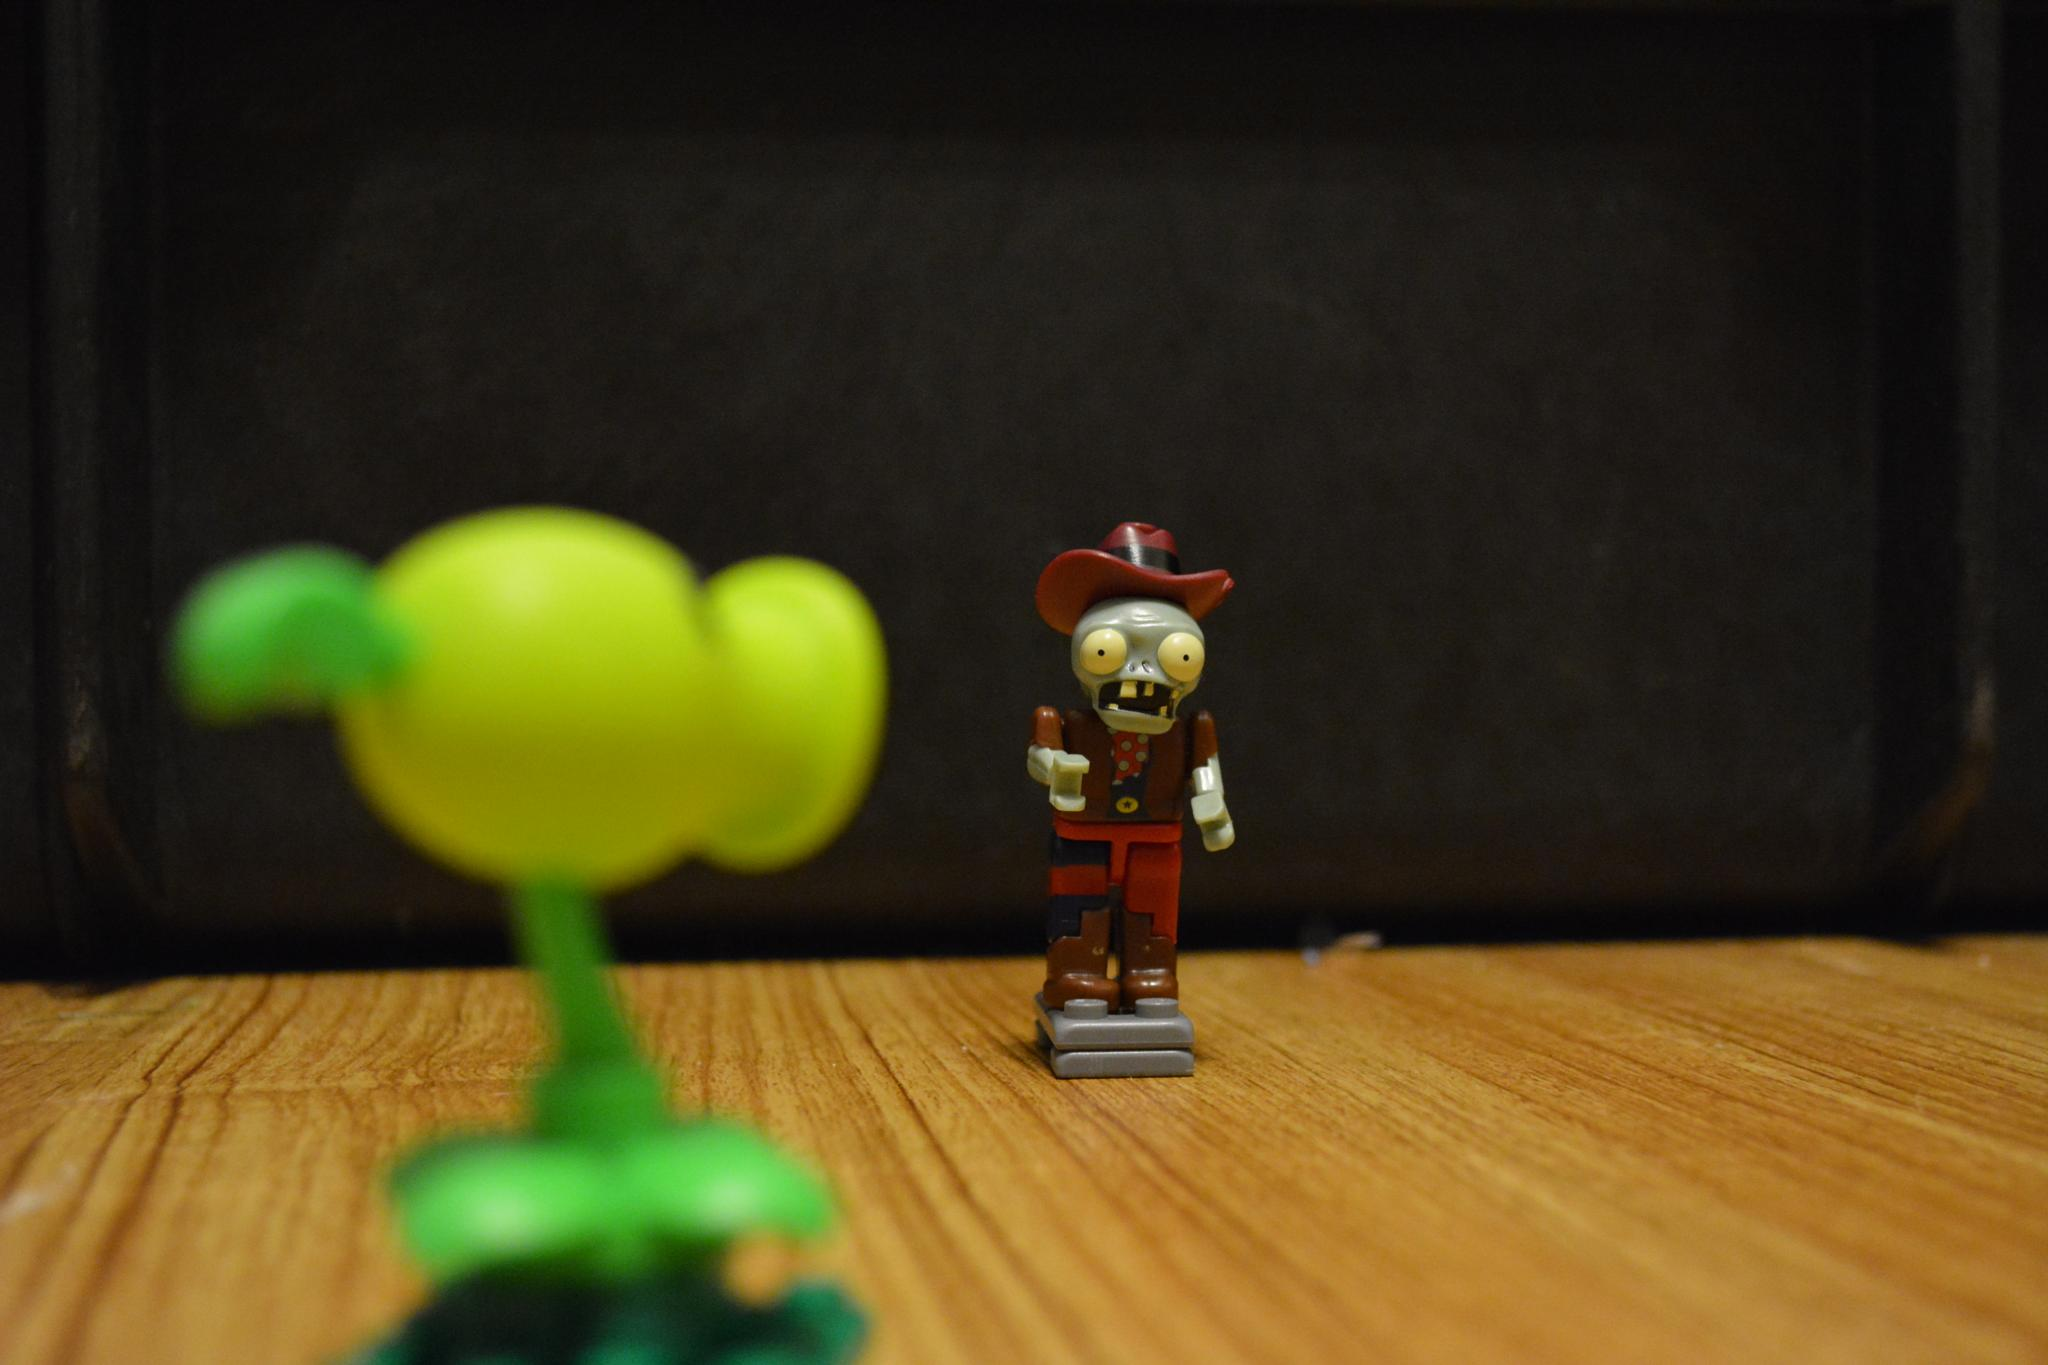 Plants vs Zombies Scene by goodnow